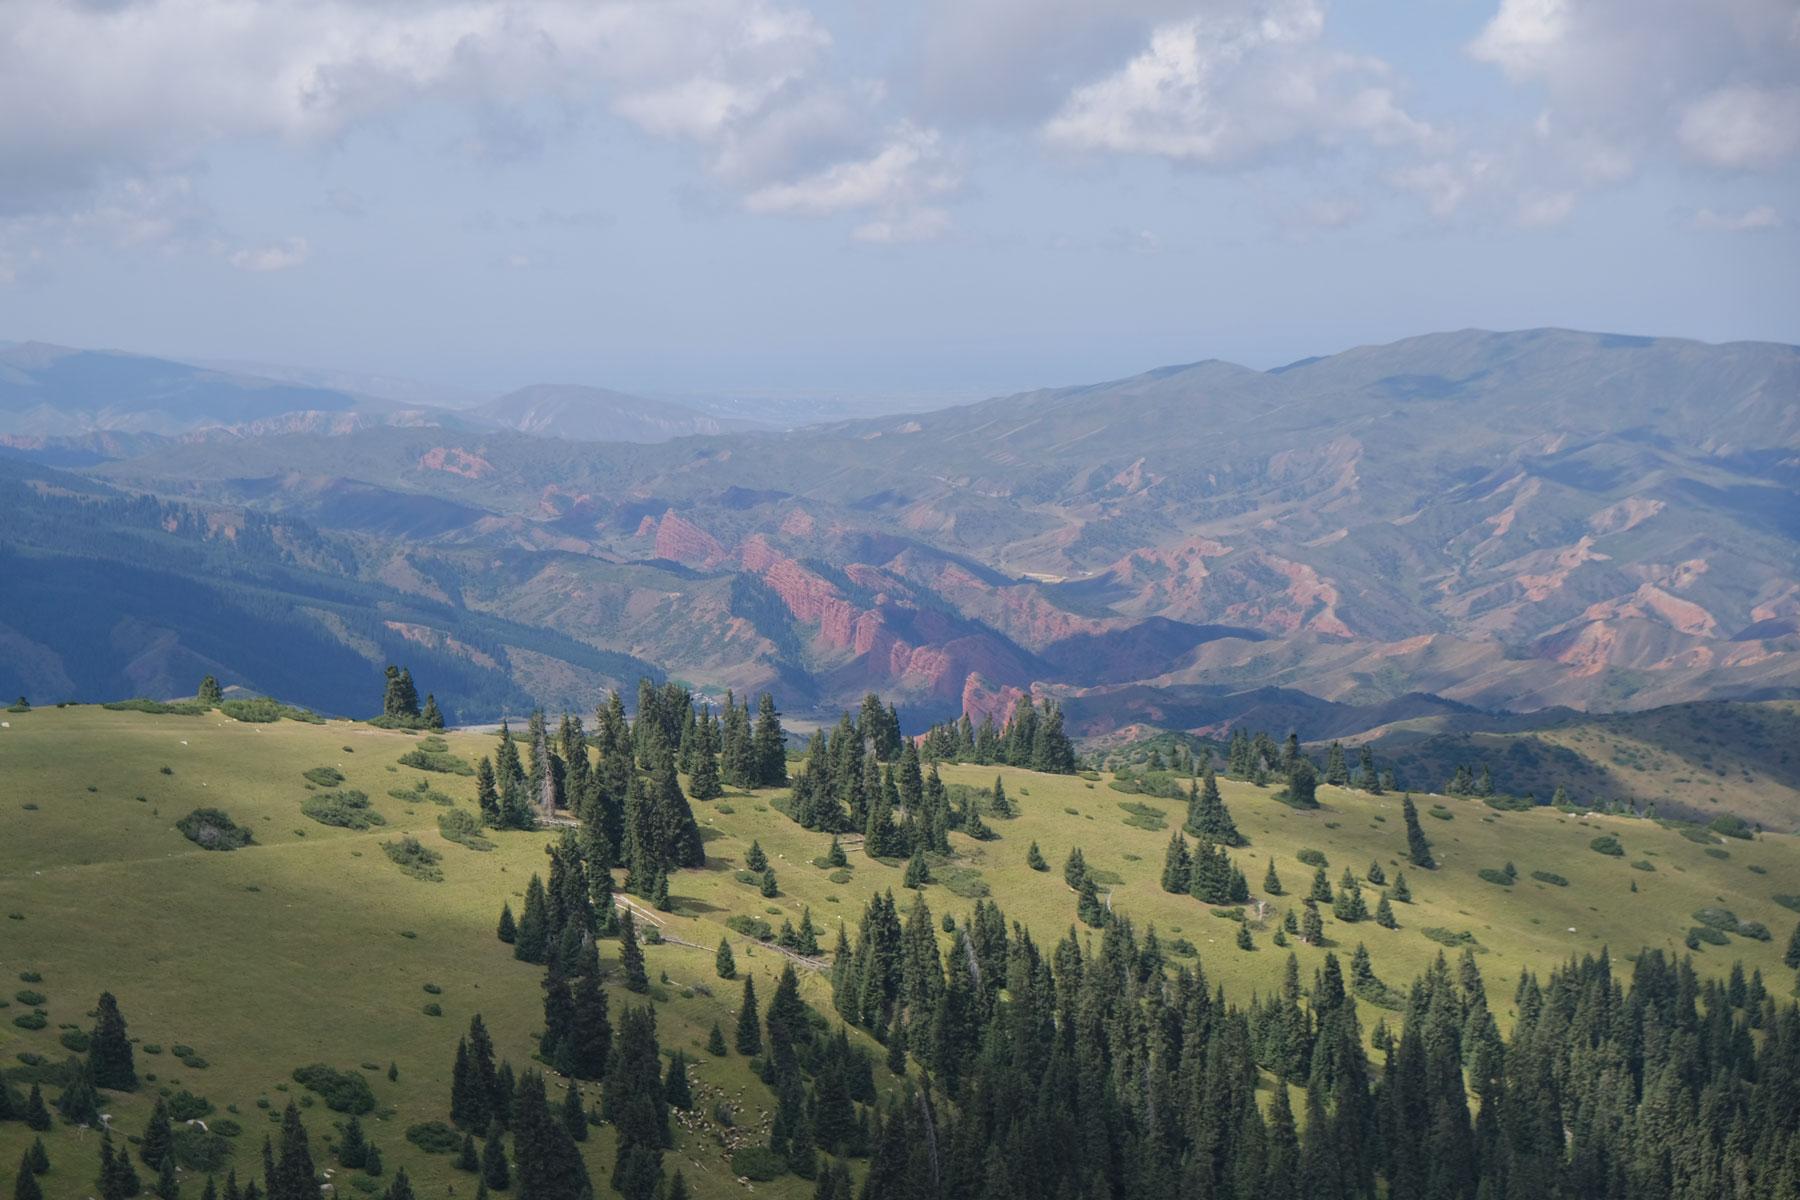 Auf dem Weg Richtung Übernachtungsplatz Nr. 2 geht es vorbei an rot leuchtenden Felsen zurück ins Tal